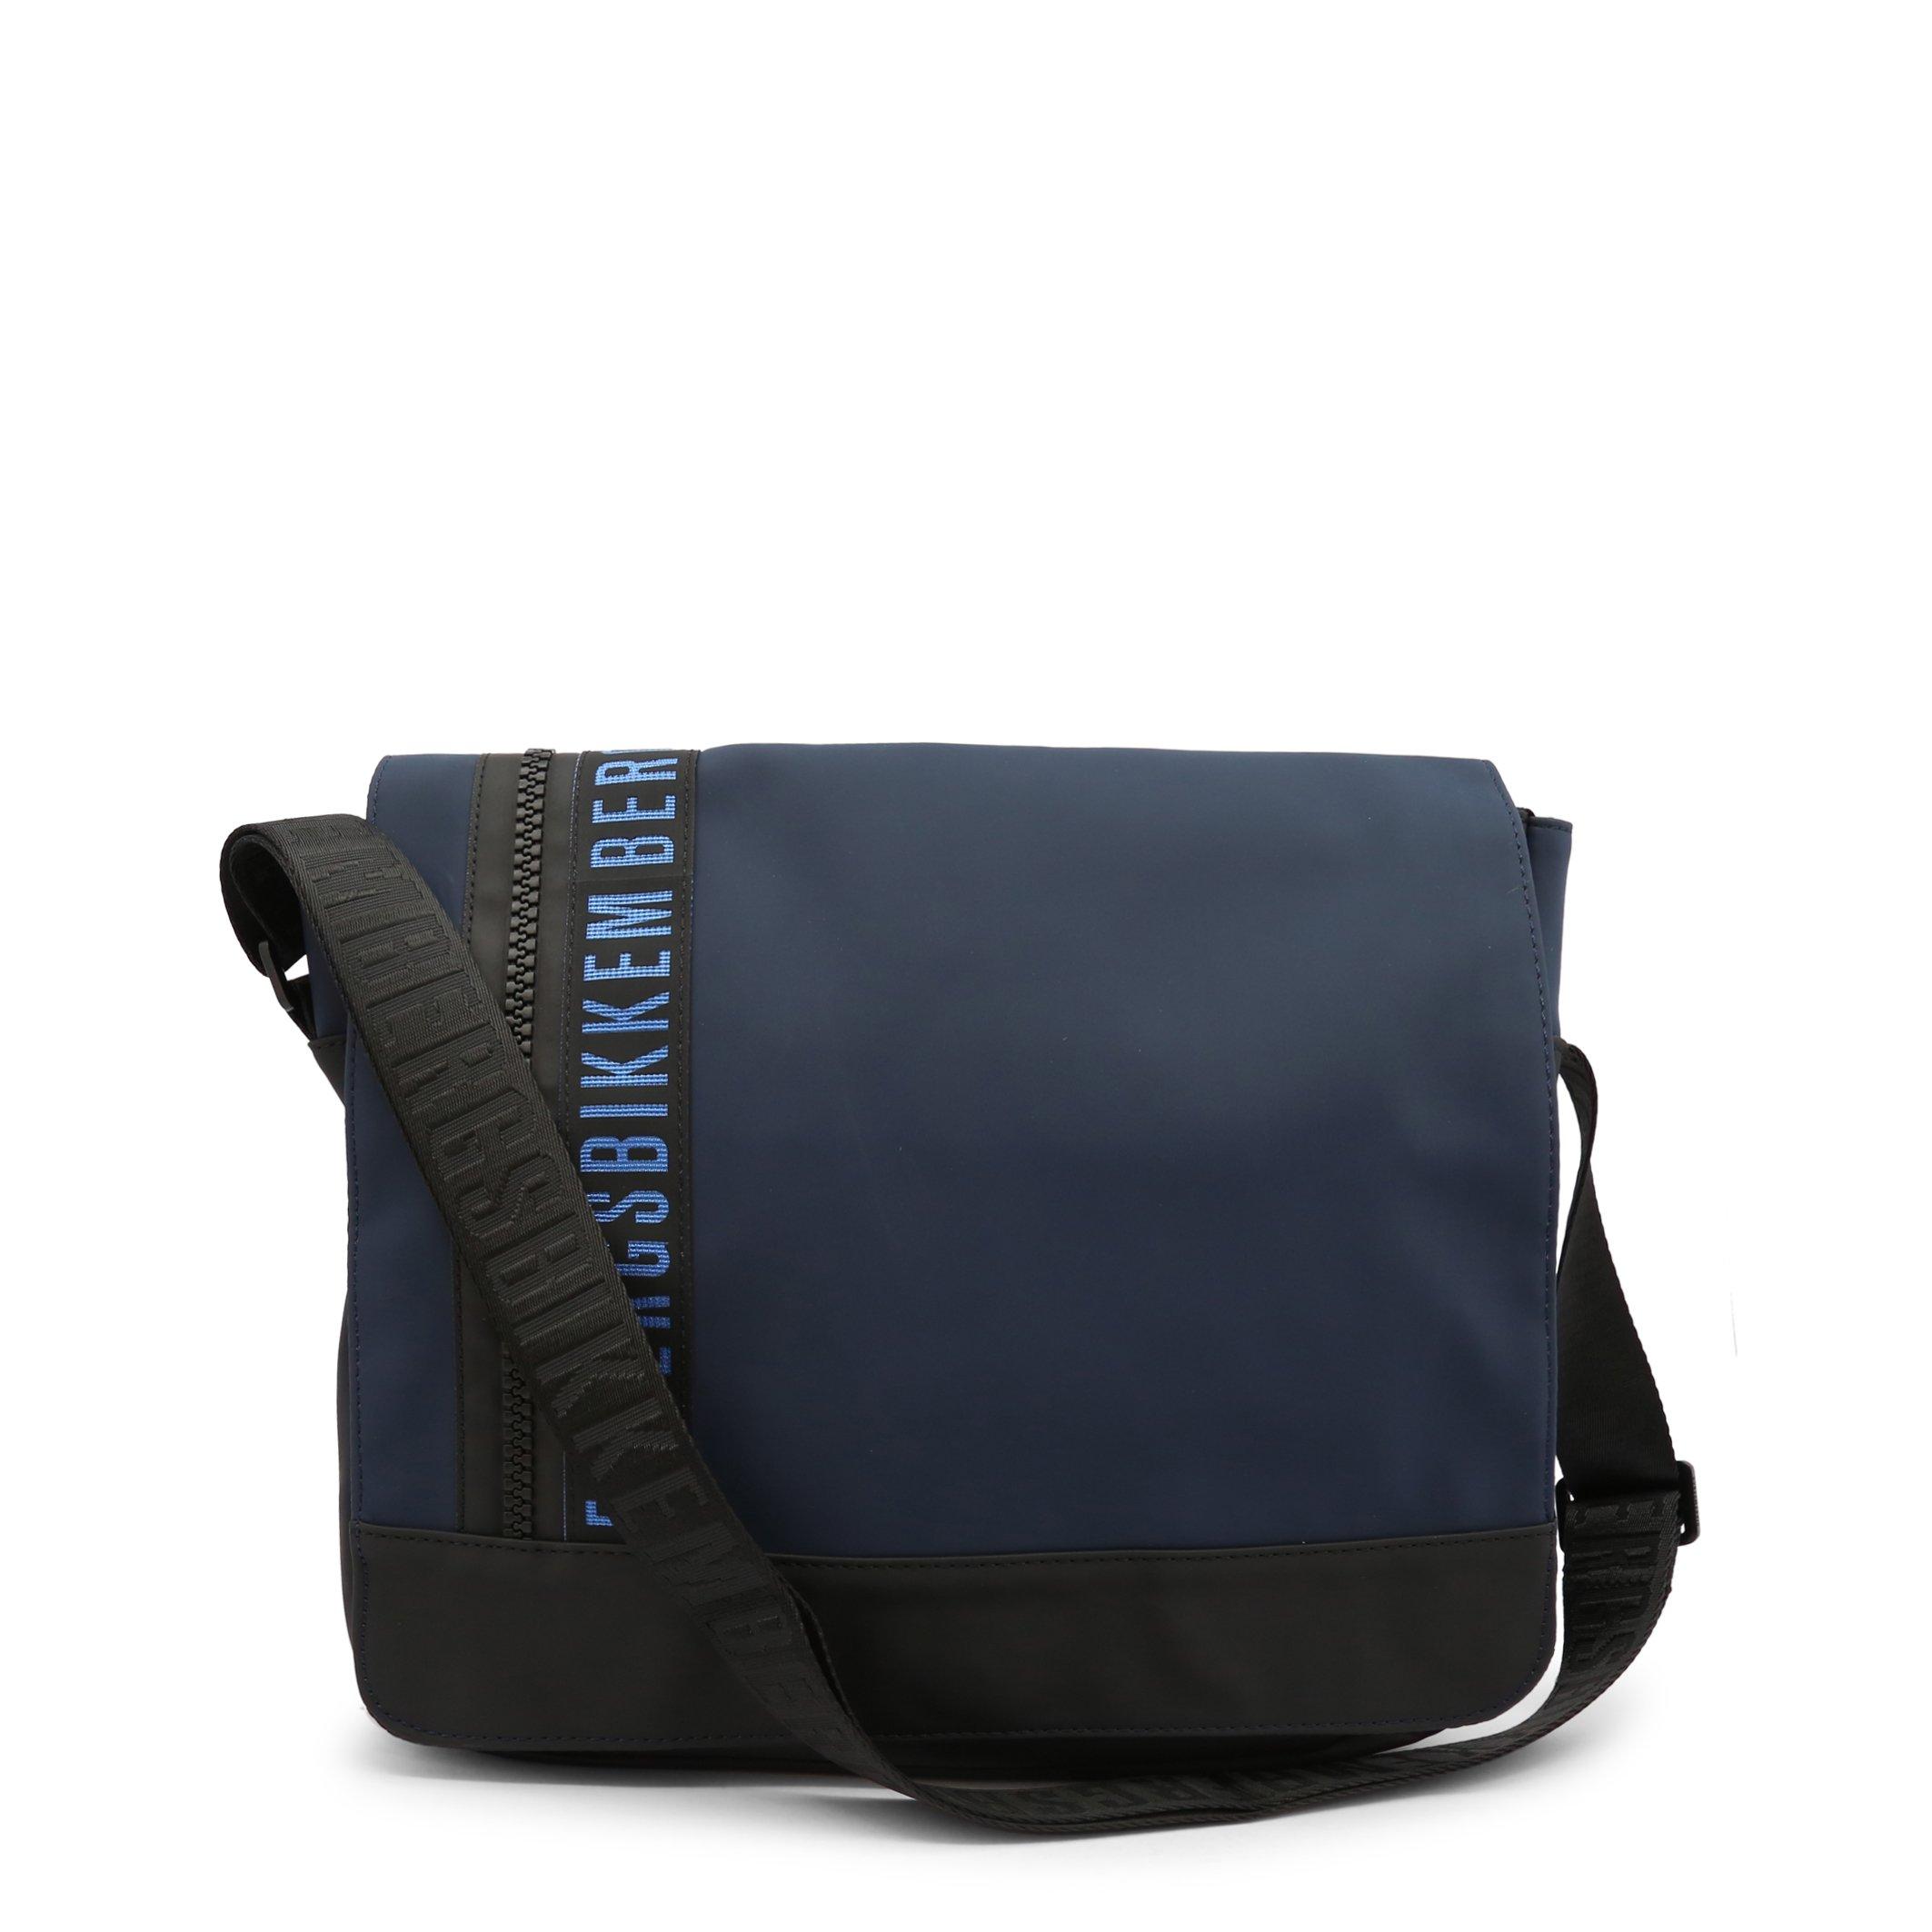 Bikkembergs Men's Briefcase Black E2BPME170042 - blue NOSIZE